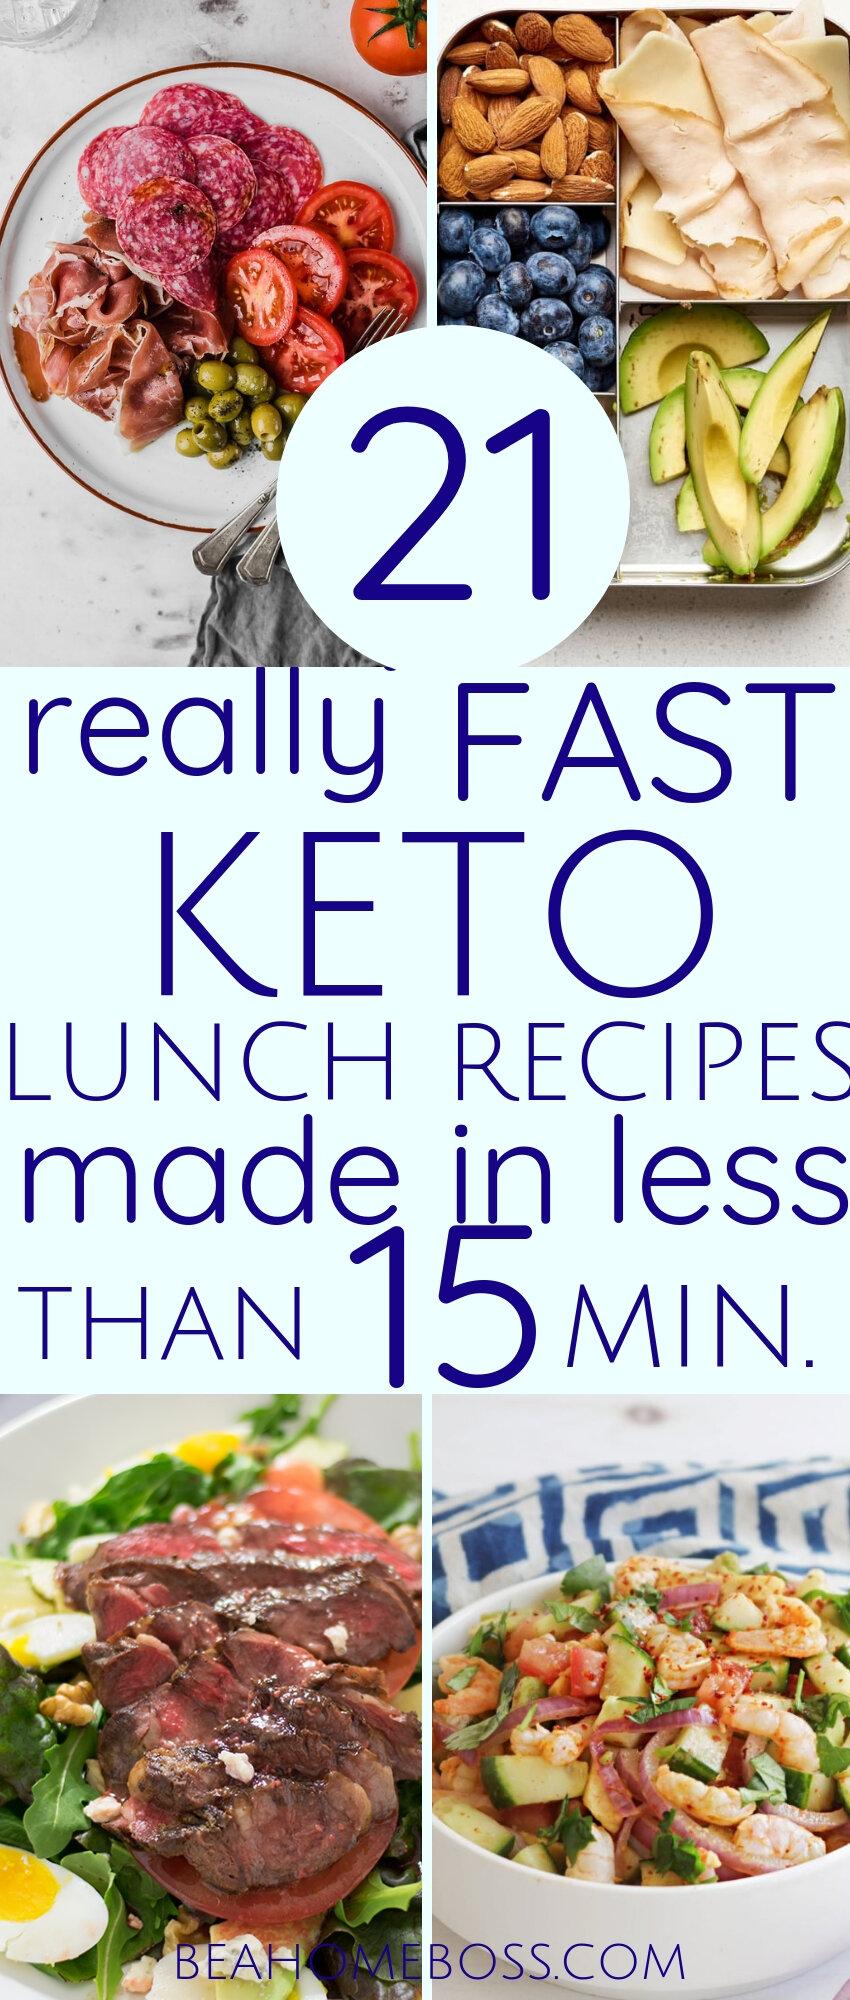 quick keto lunch recipes.jpg